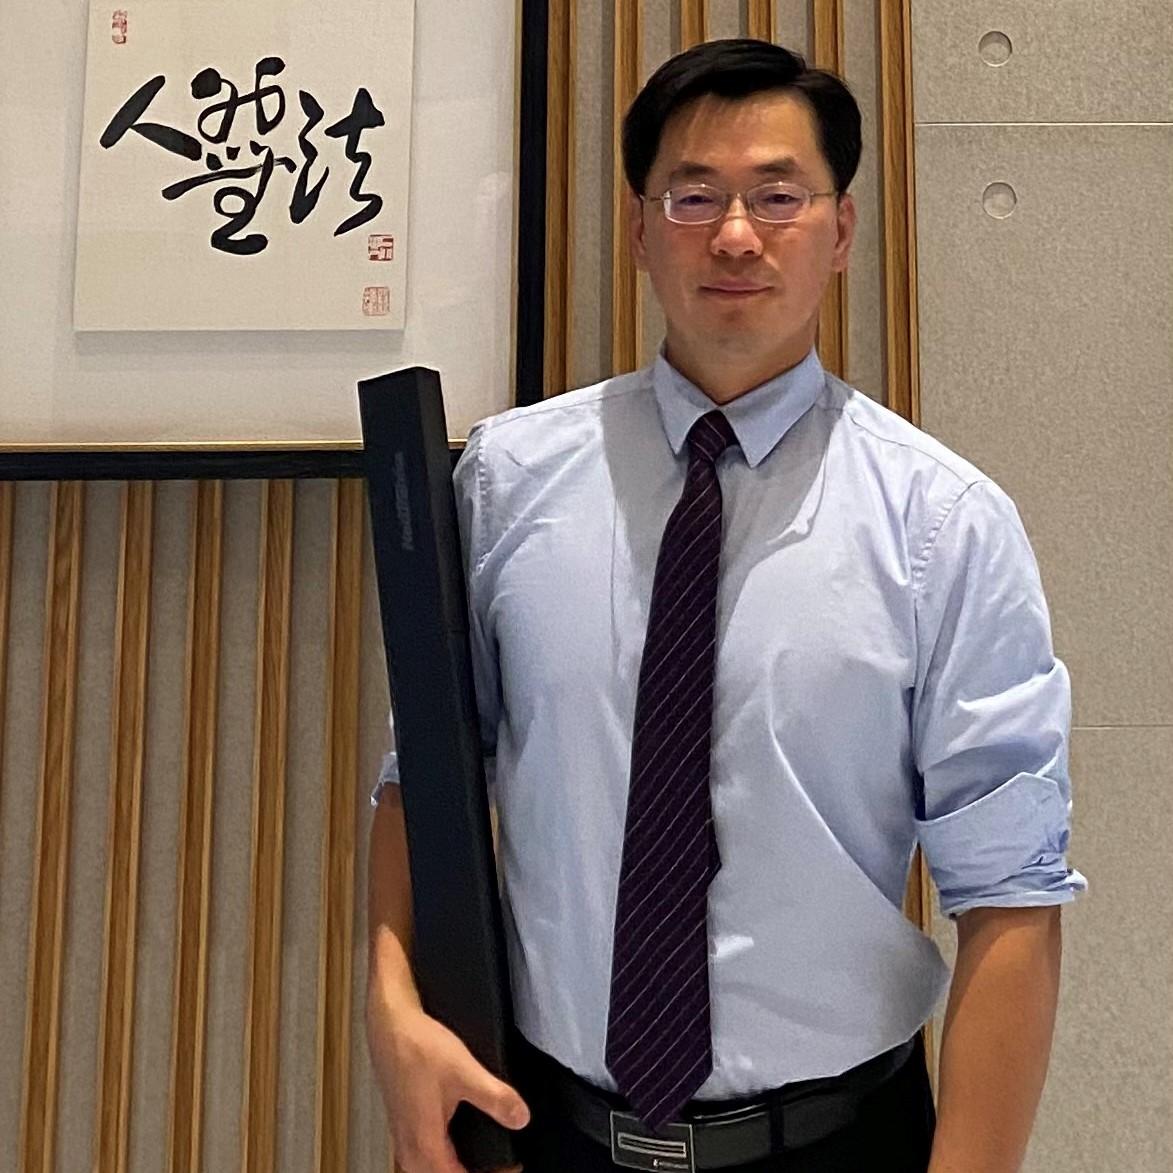 陳錫平  Hsi-Ping Chen